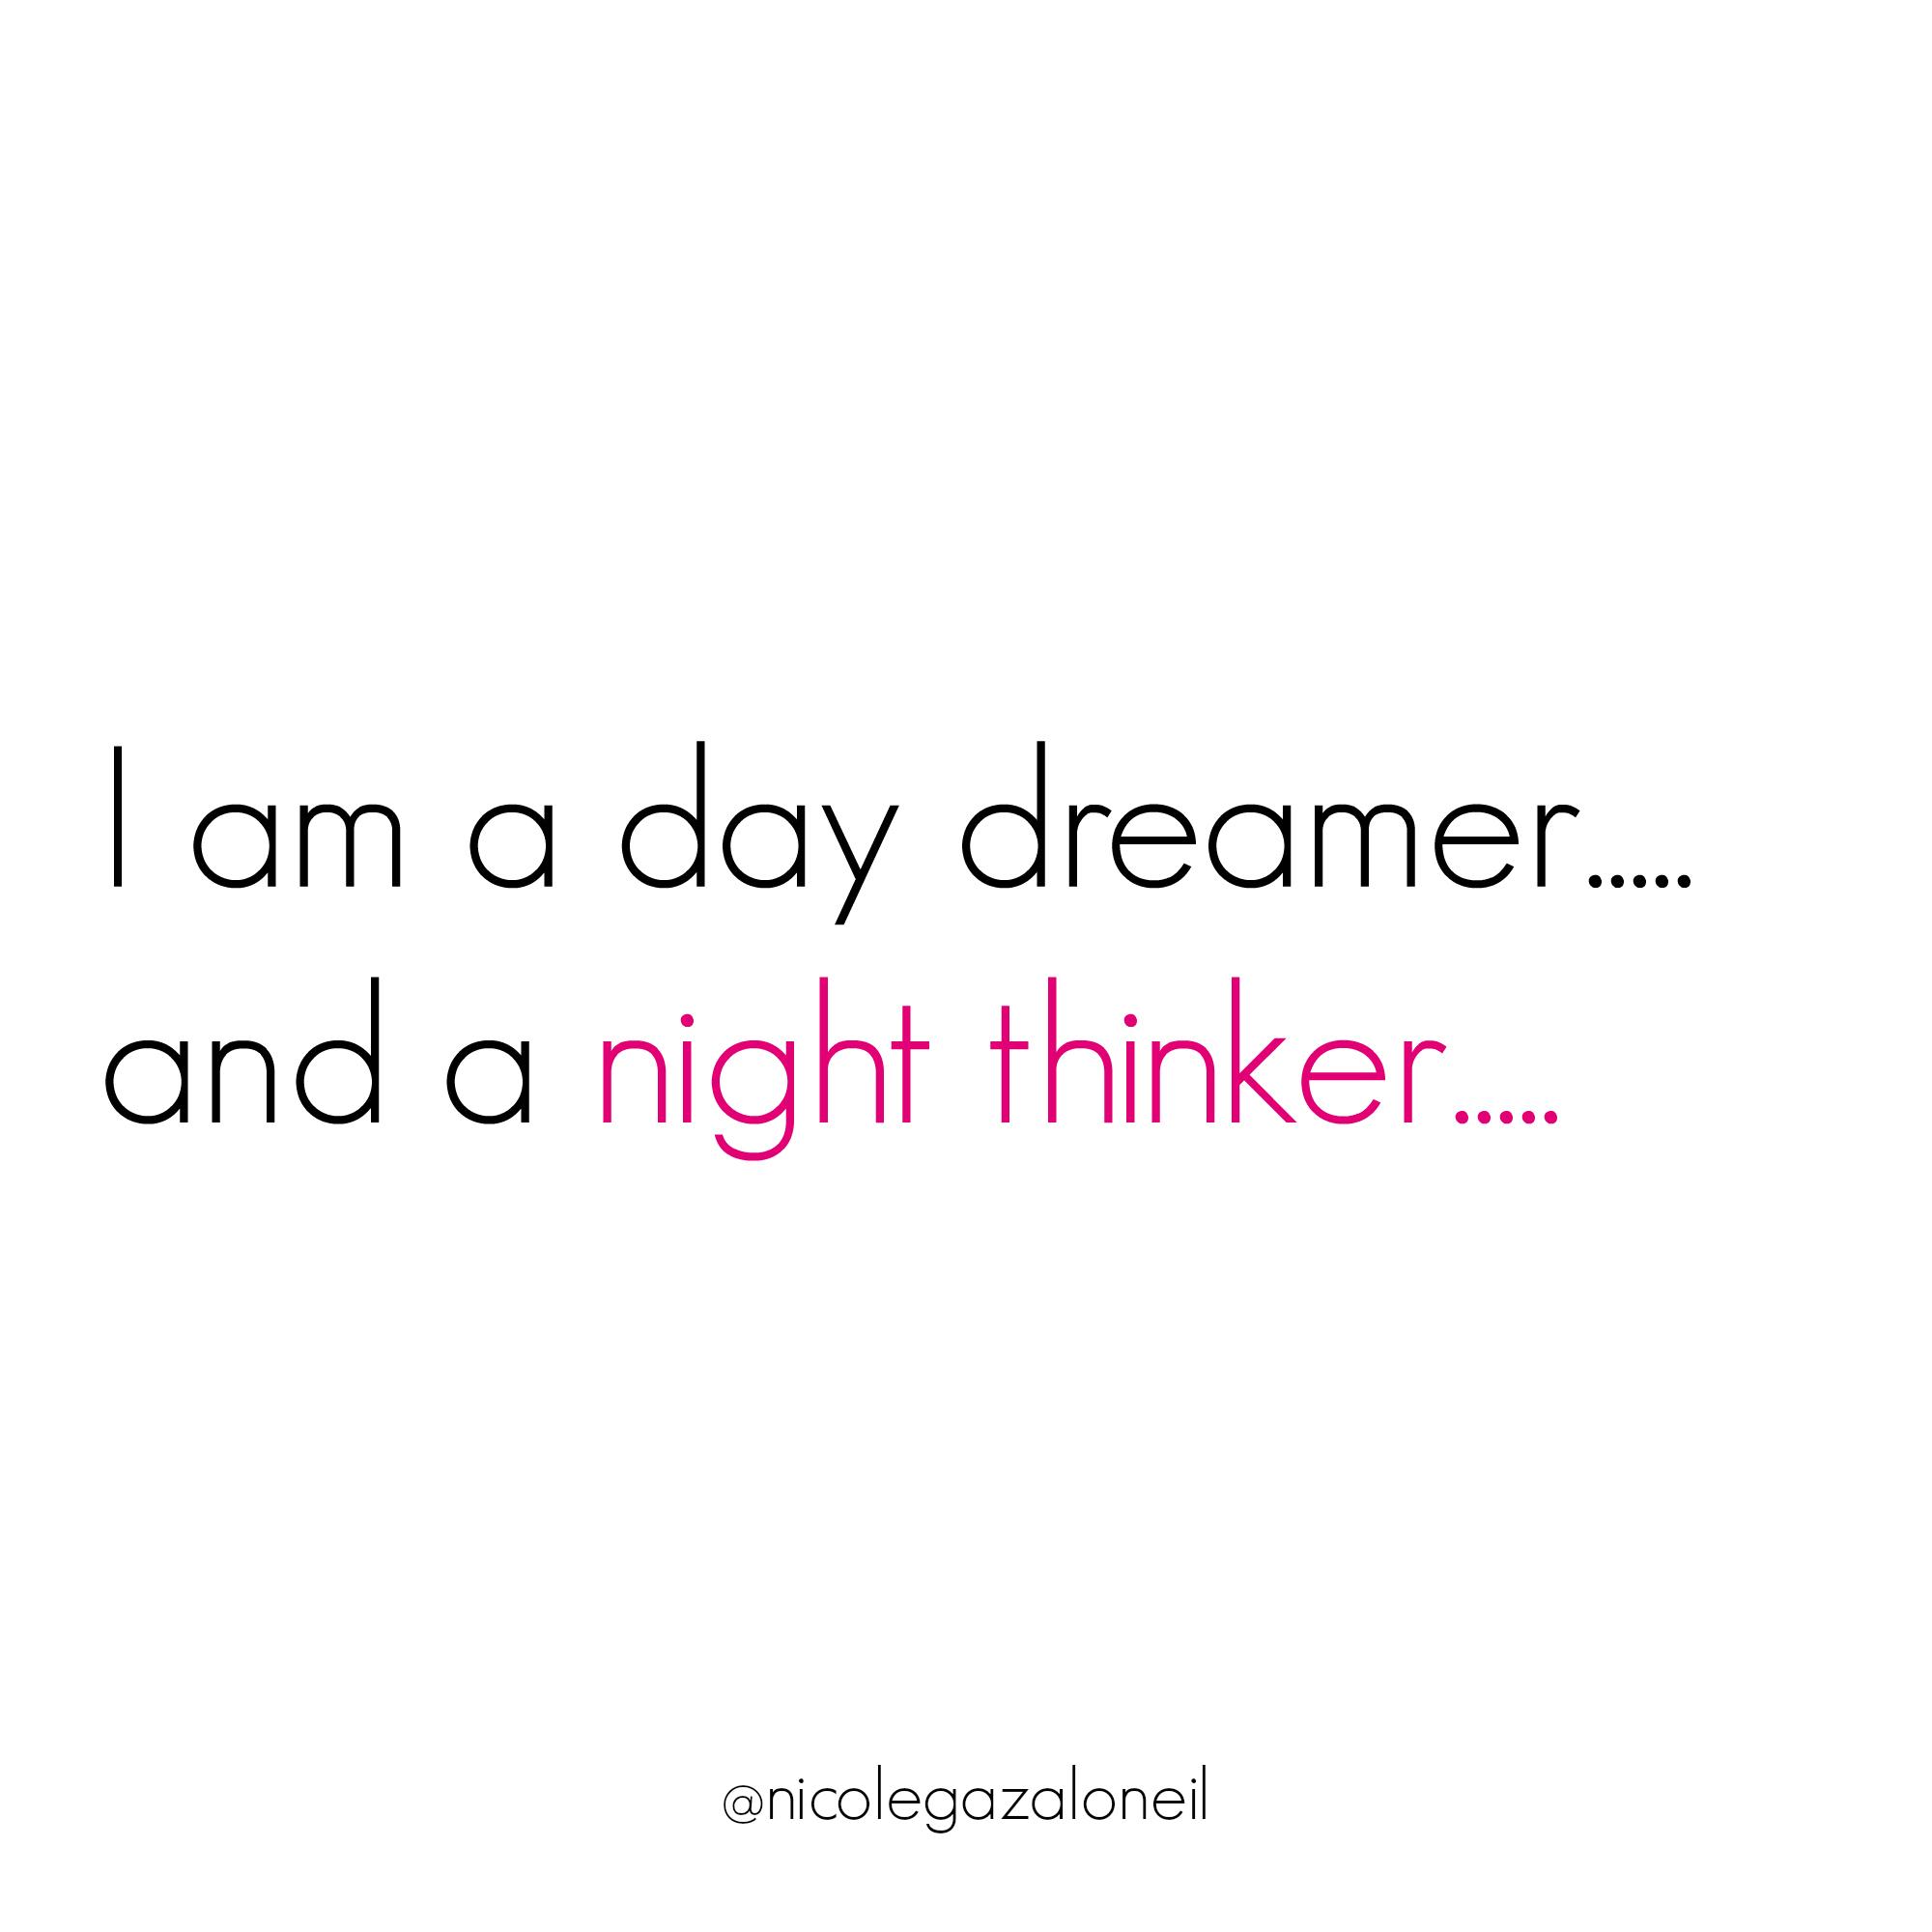 I'm a day dreamer and a night thinker.jpg